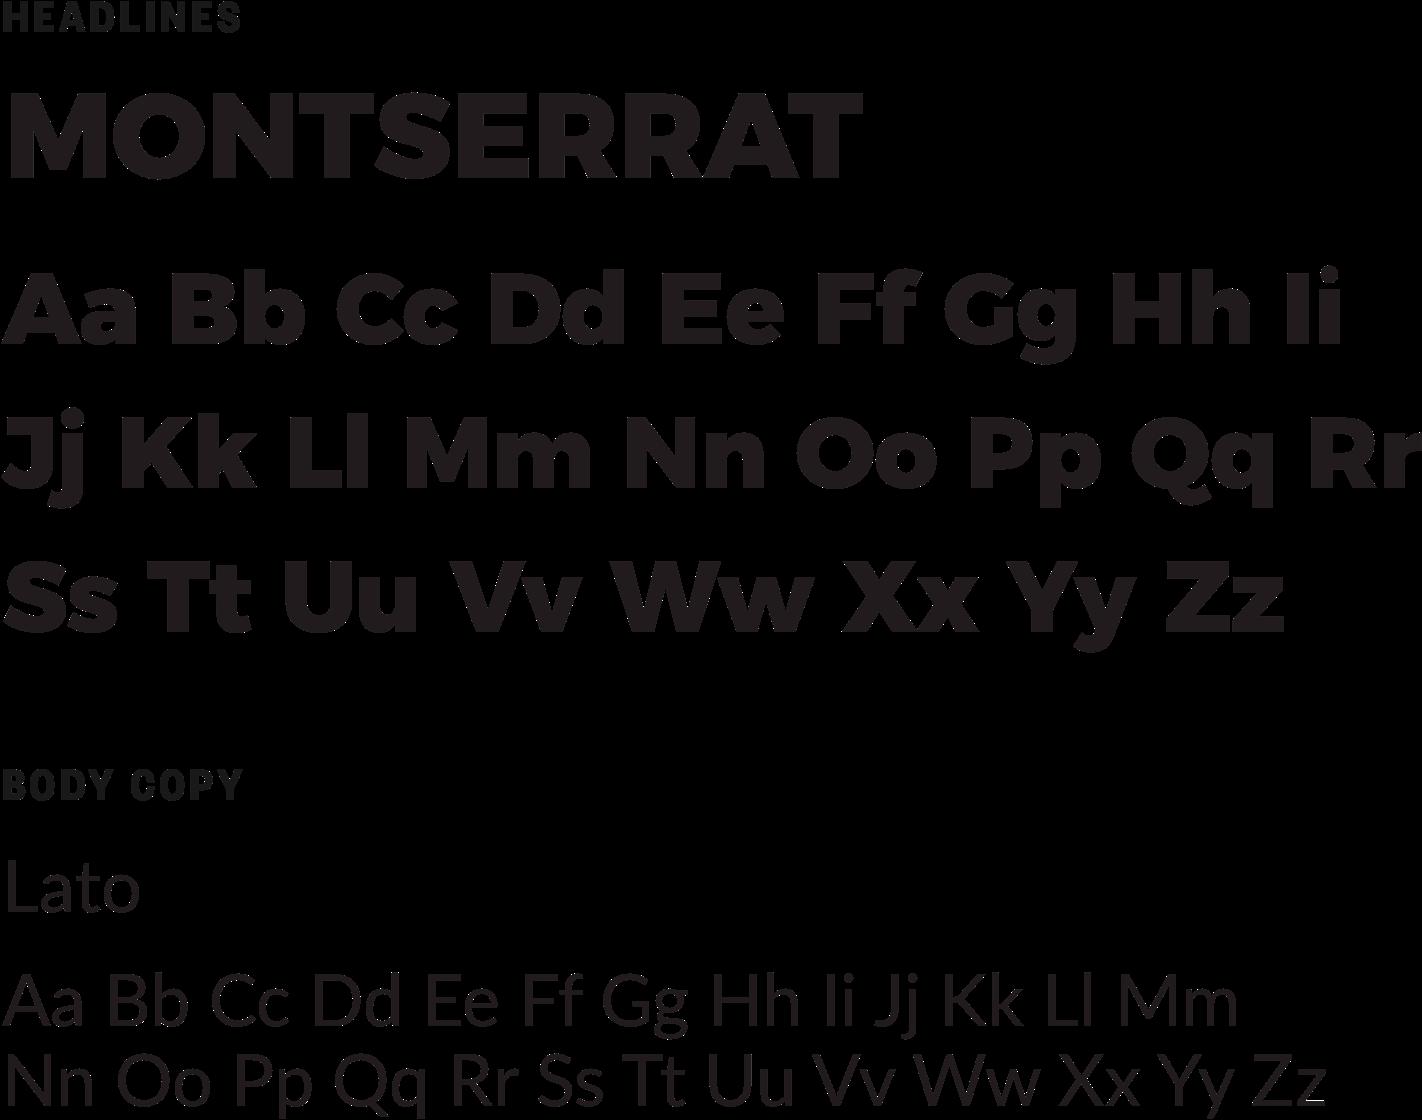 cg42-brand-typefaces